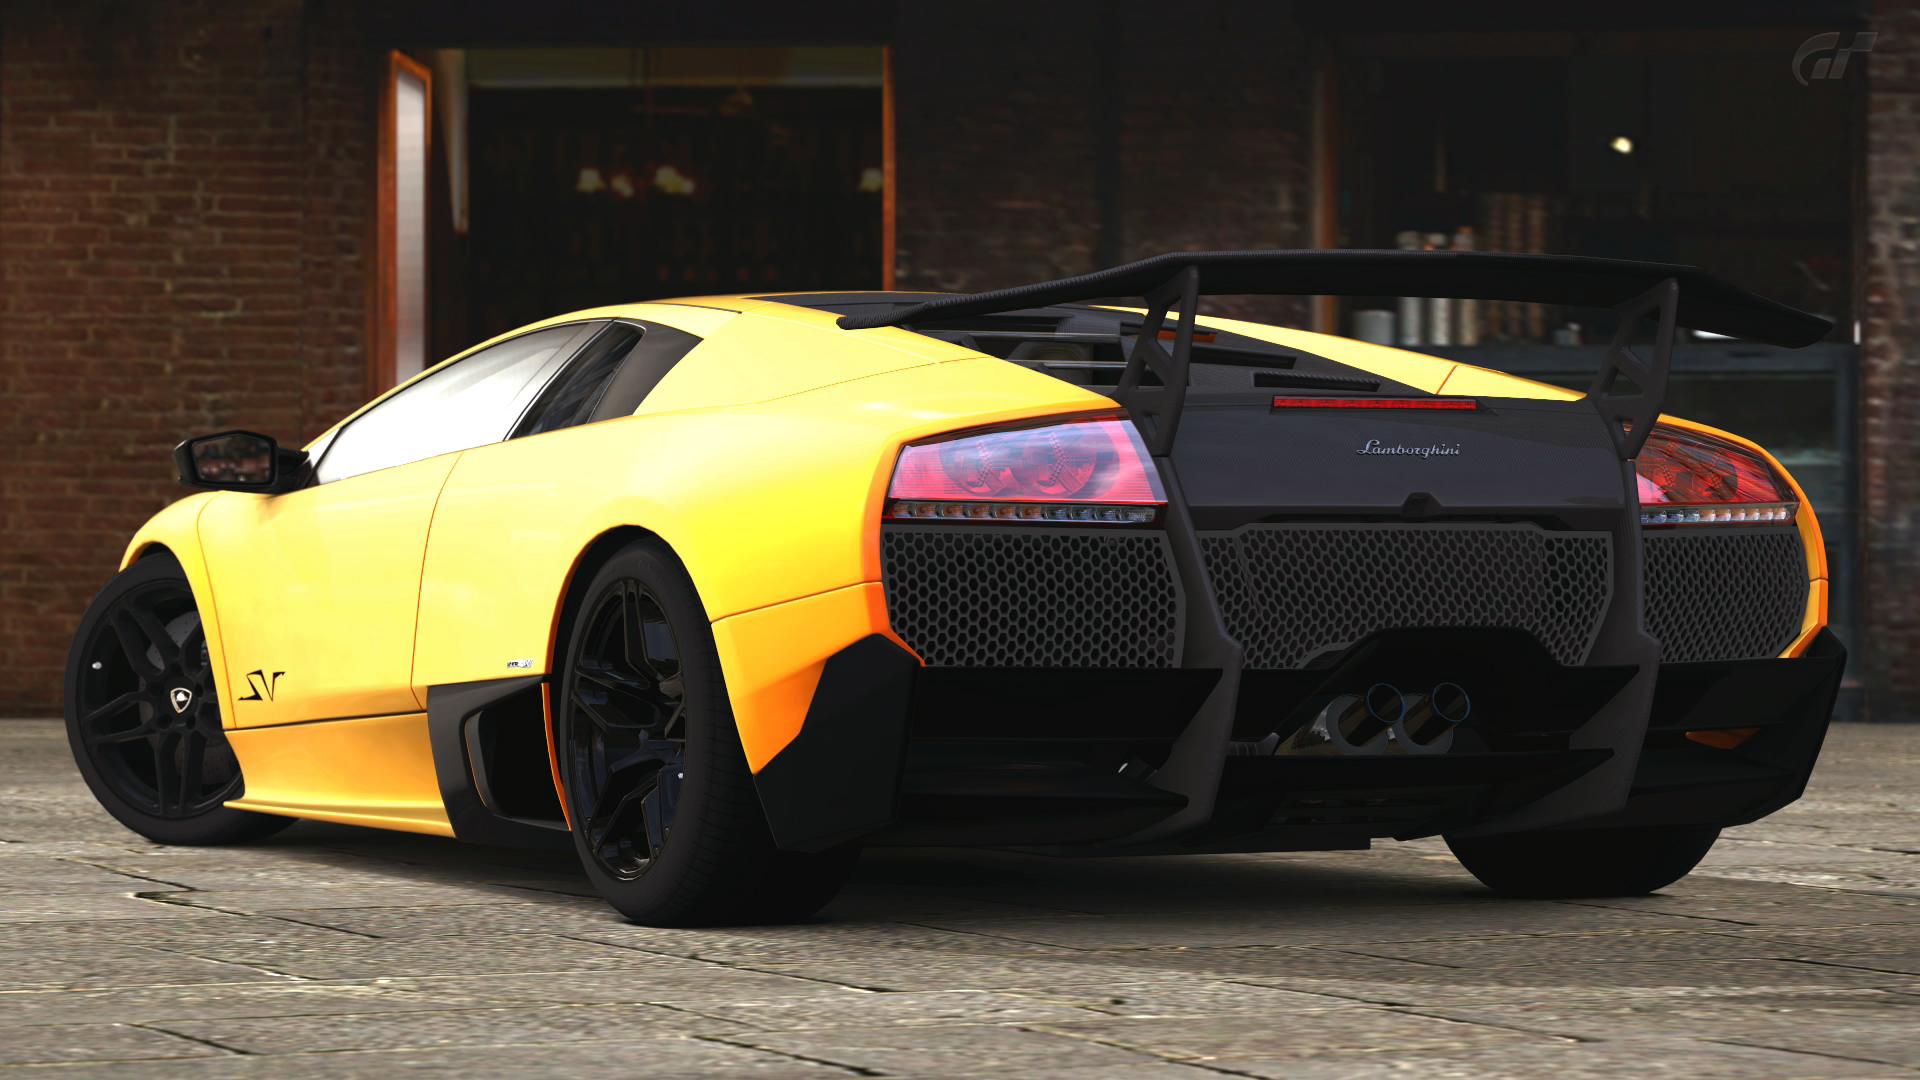 Lamborghini Murcielago LP SV hone wallpapers for